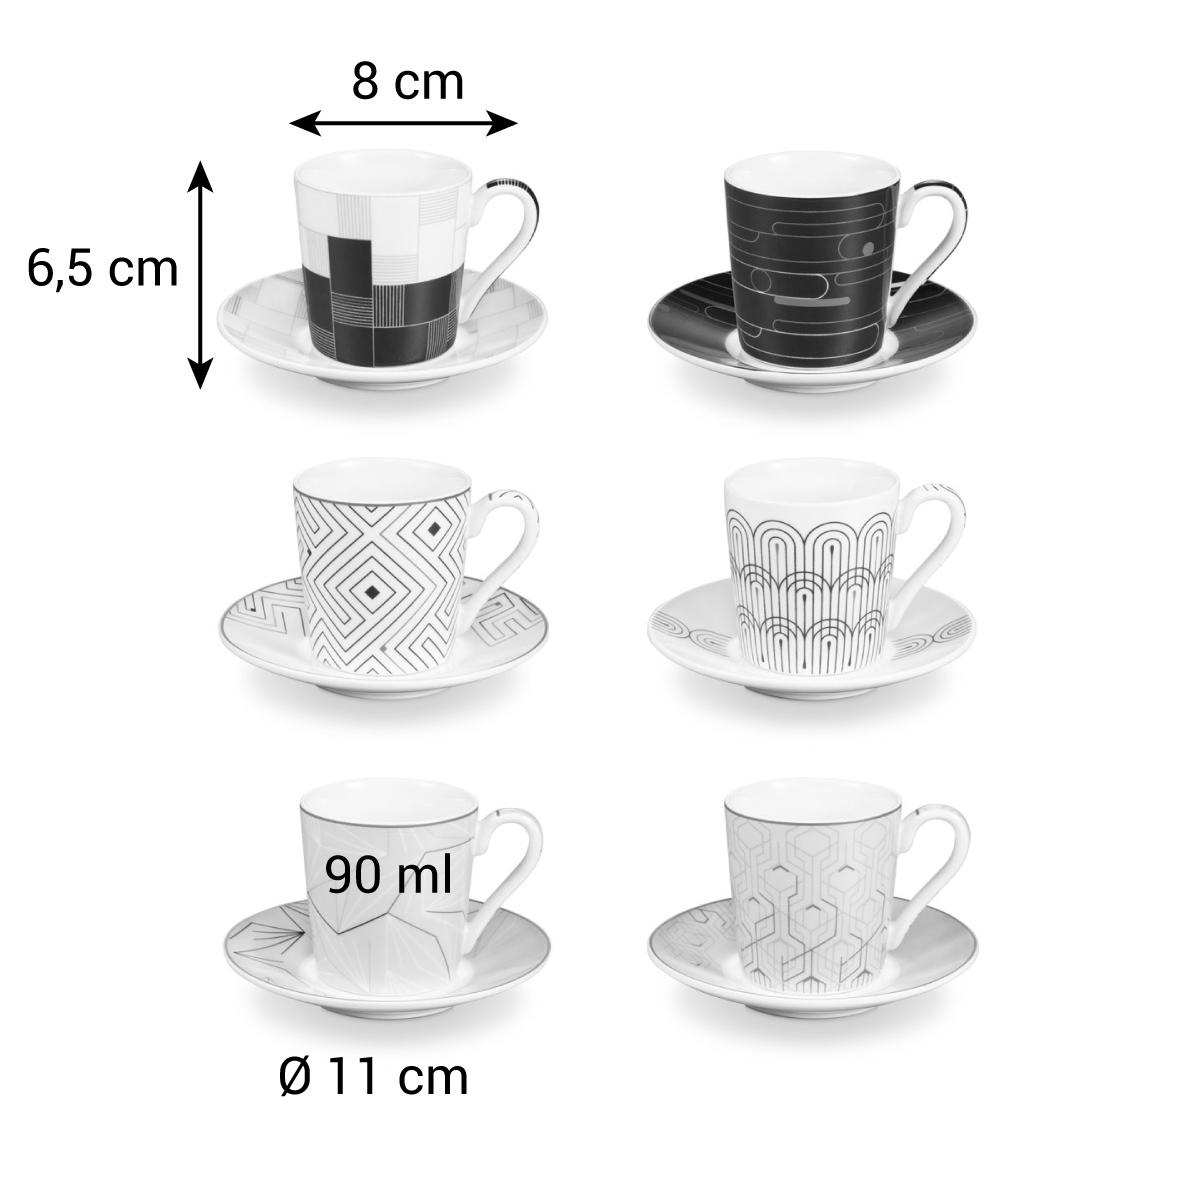 Šálek na espresso s podšálkem myCOFFEE, 6 ks, Infinity